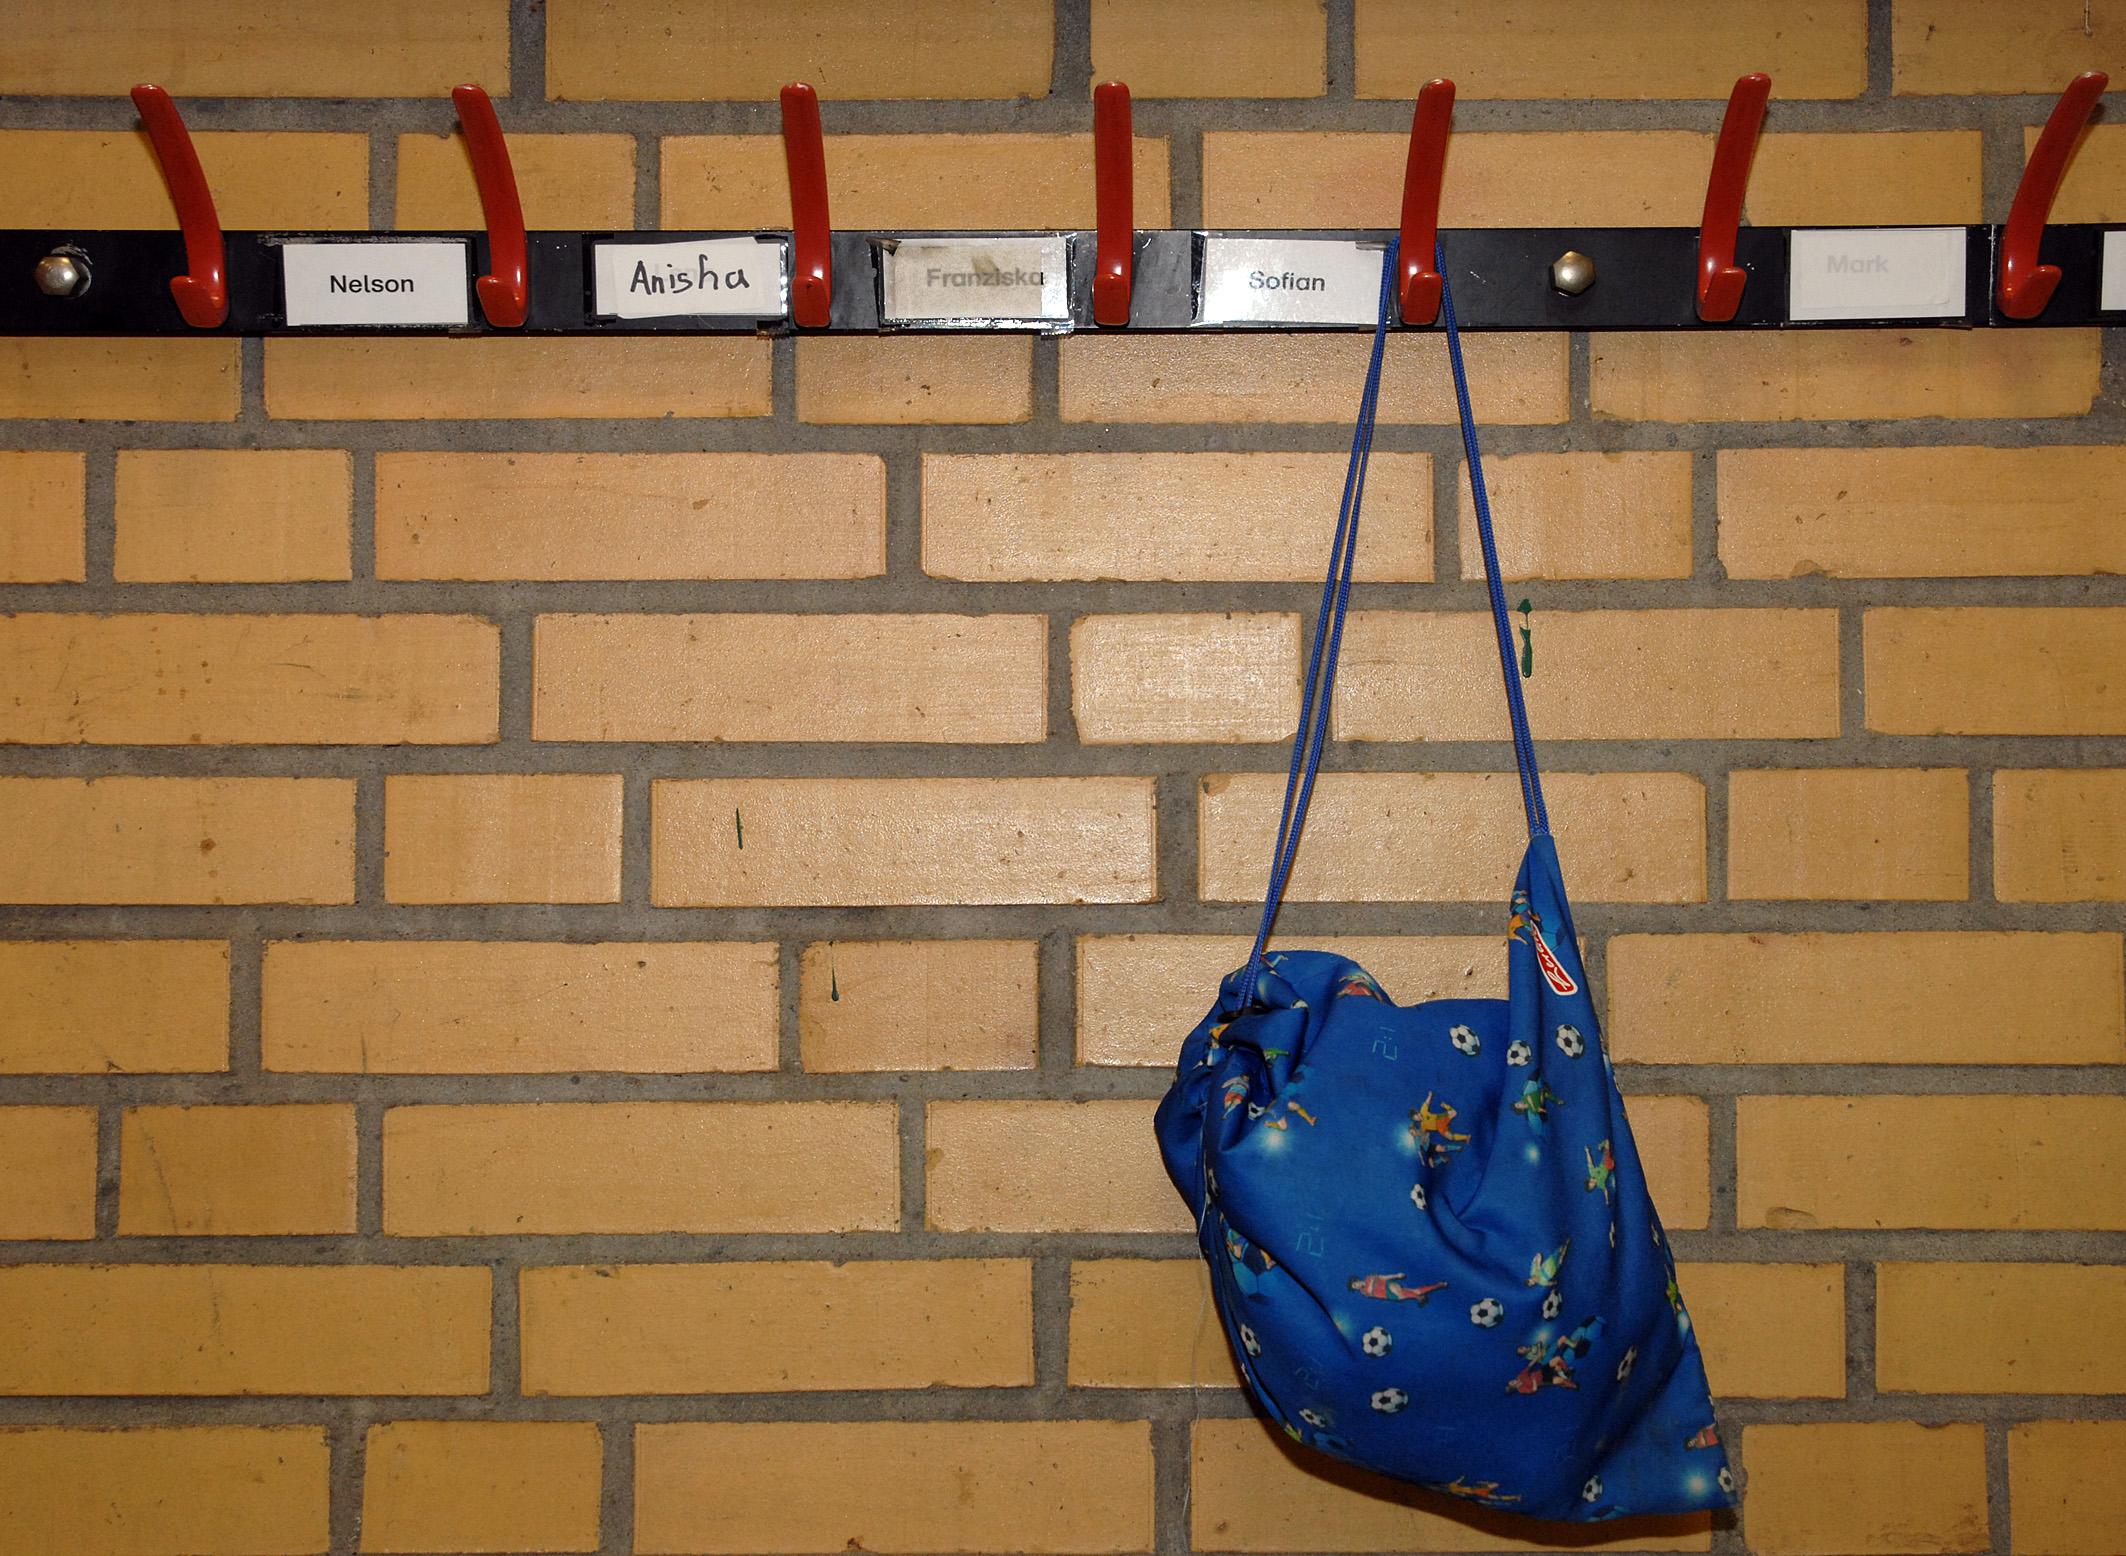 Foto: an der Wand aufgehängter Turnbeutel